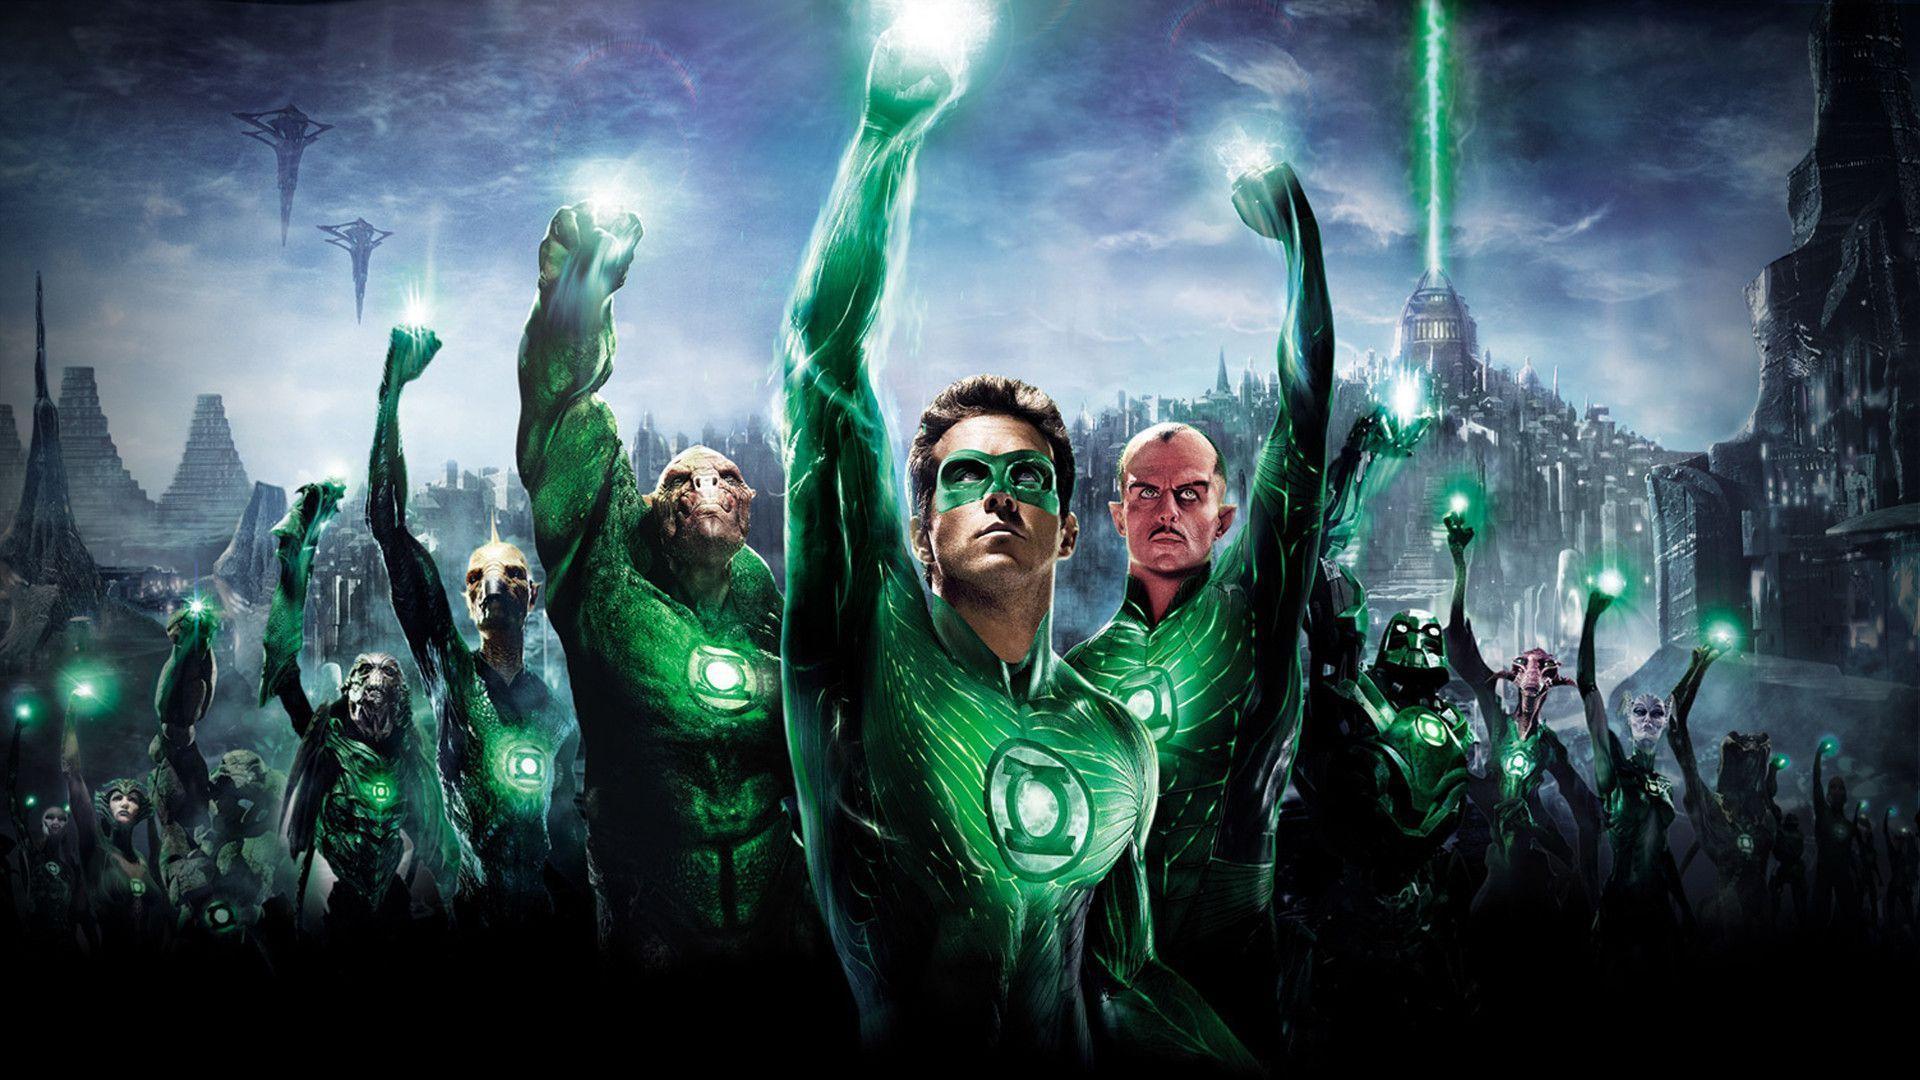 Superhero Movie Wallpapers - Wallpaper Cave